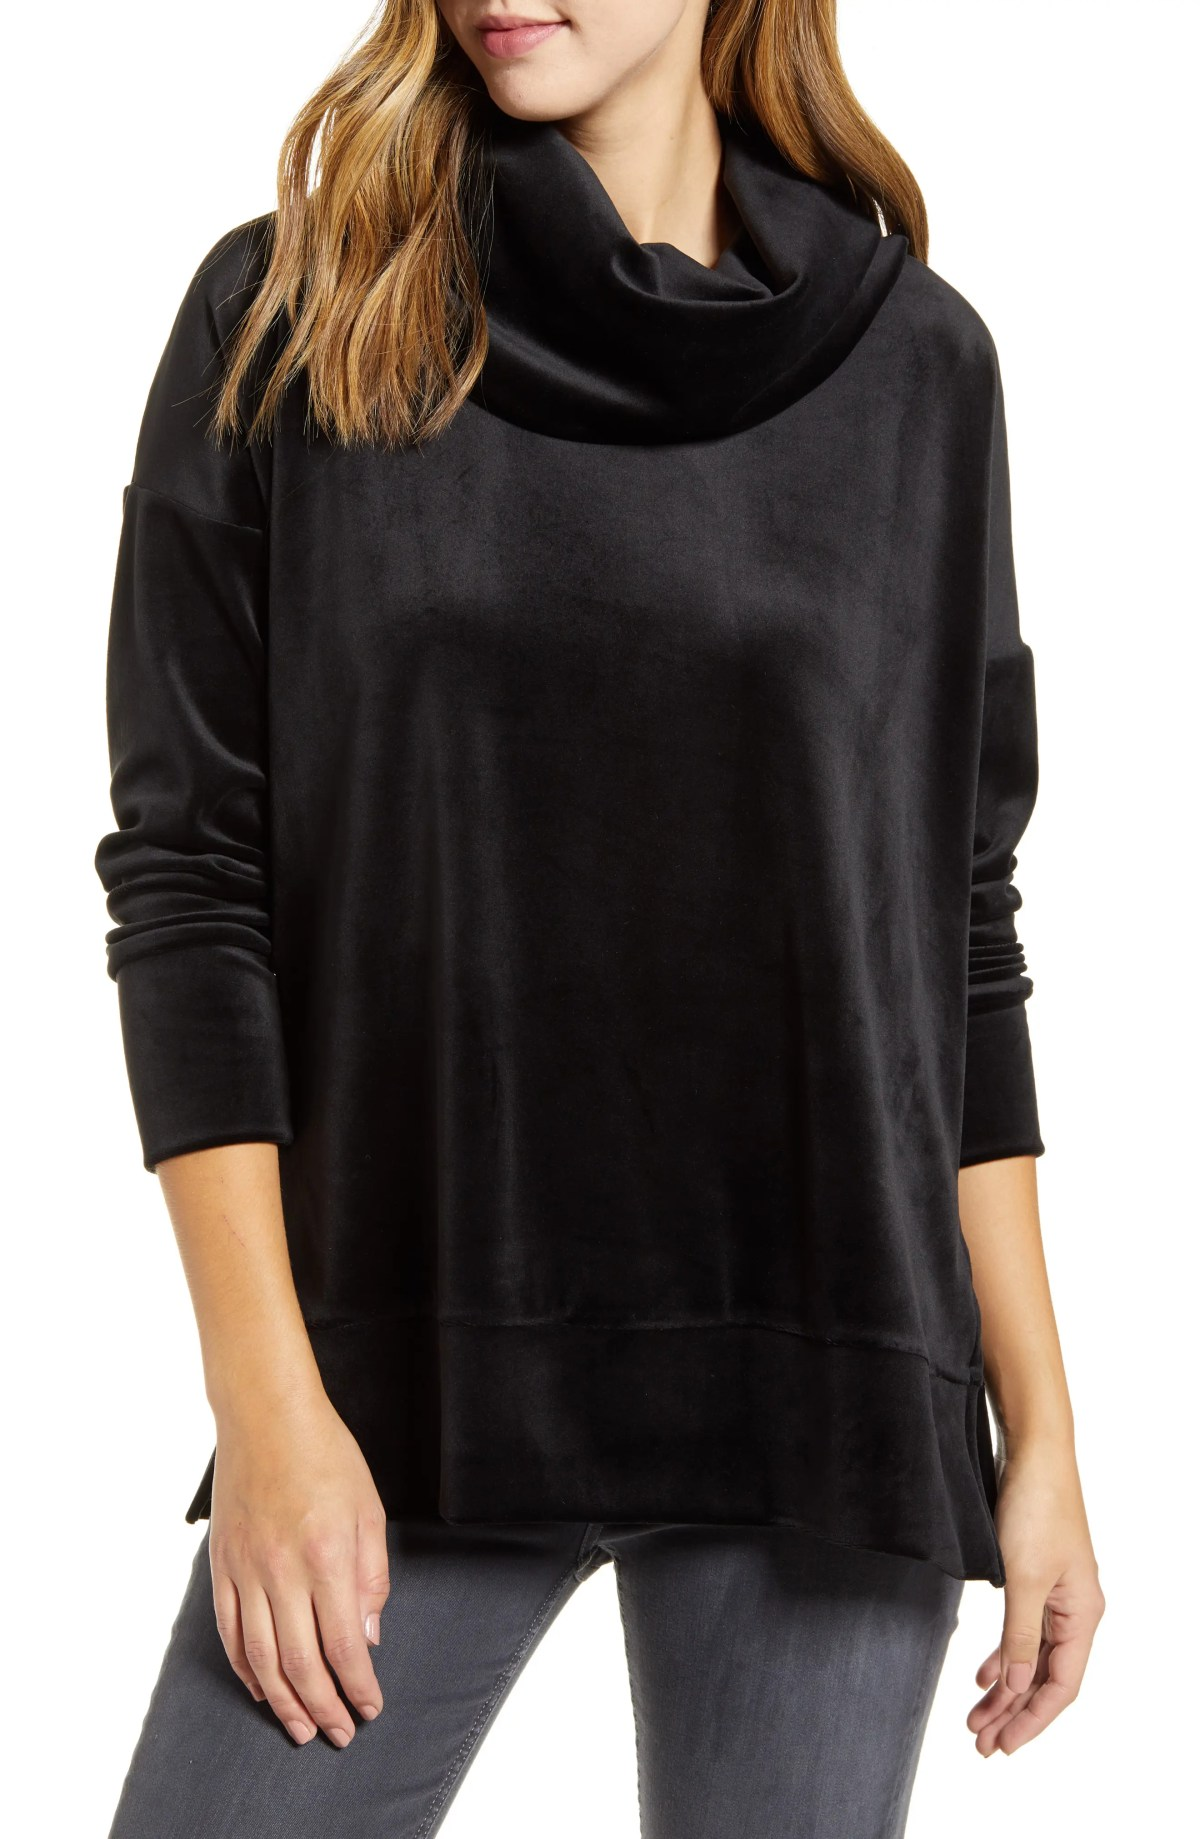 LOVEAPPELLA Velvet Cowl Neck Tunic Top, Main, color, BLACK